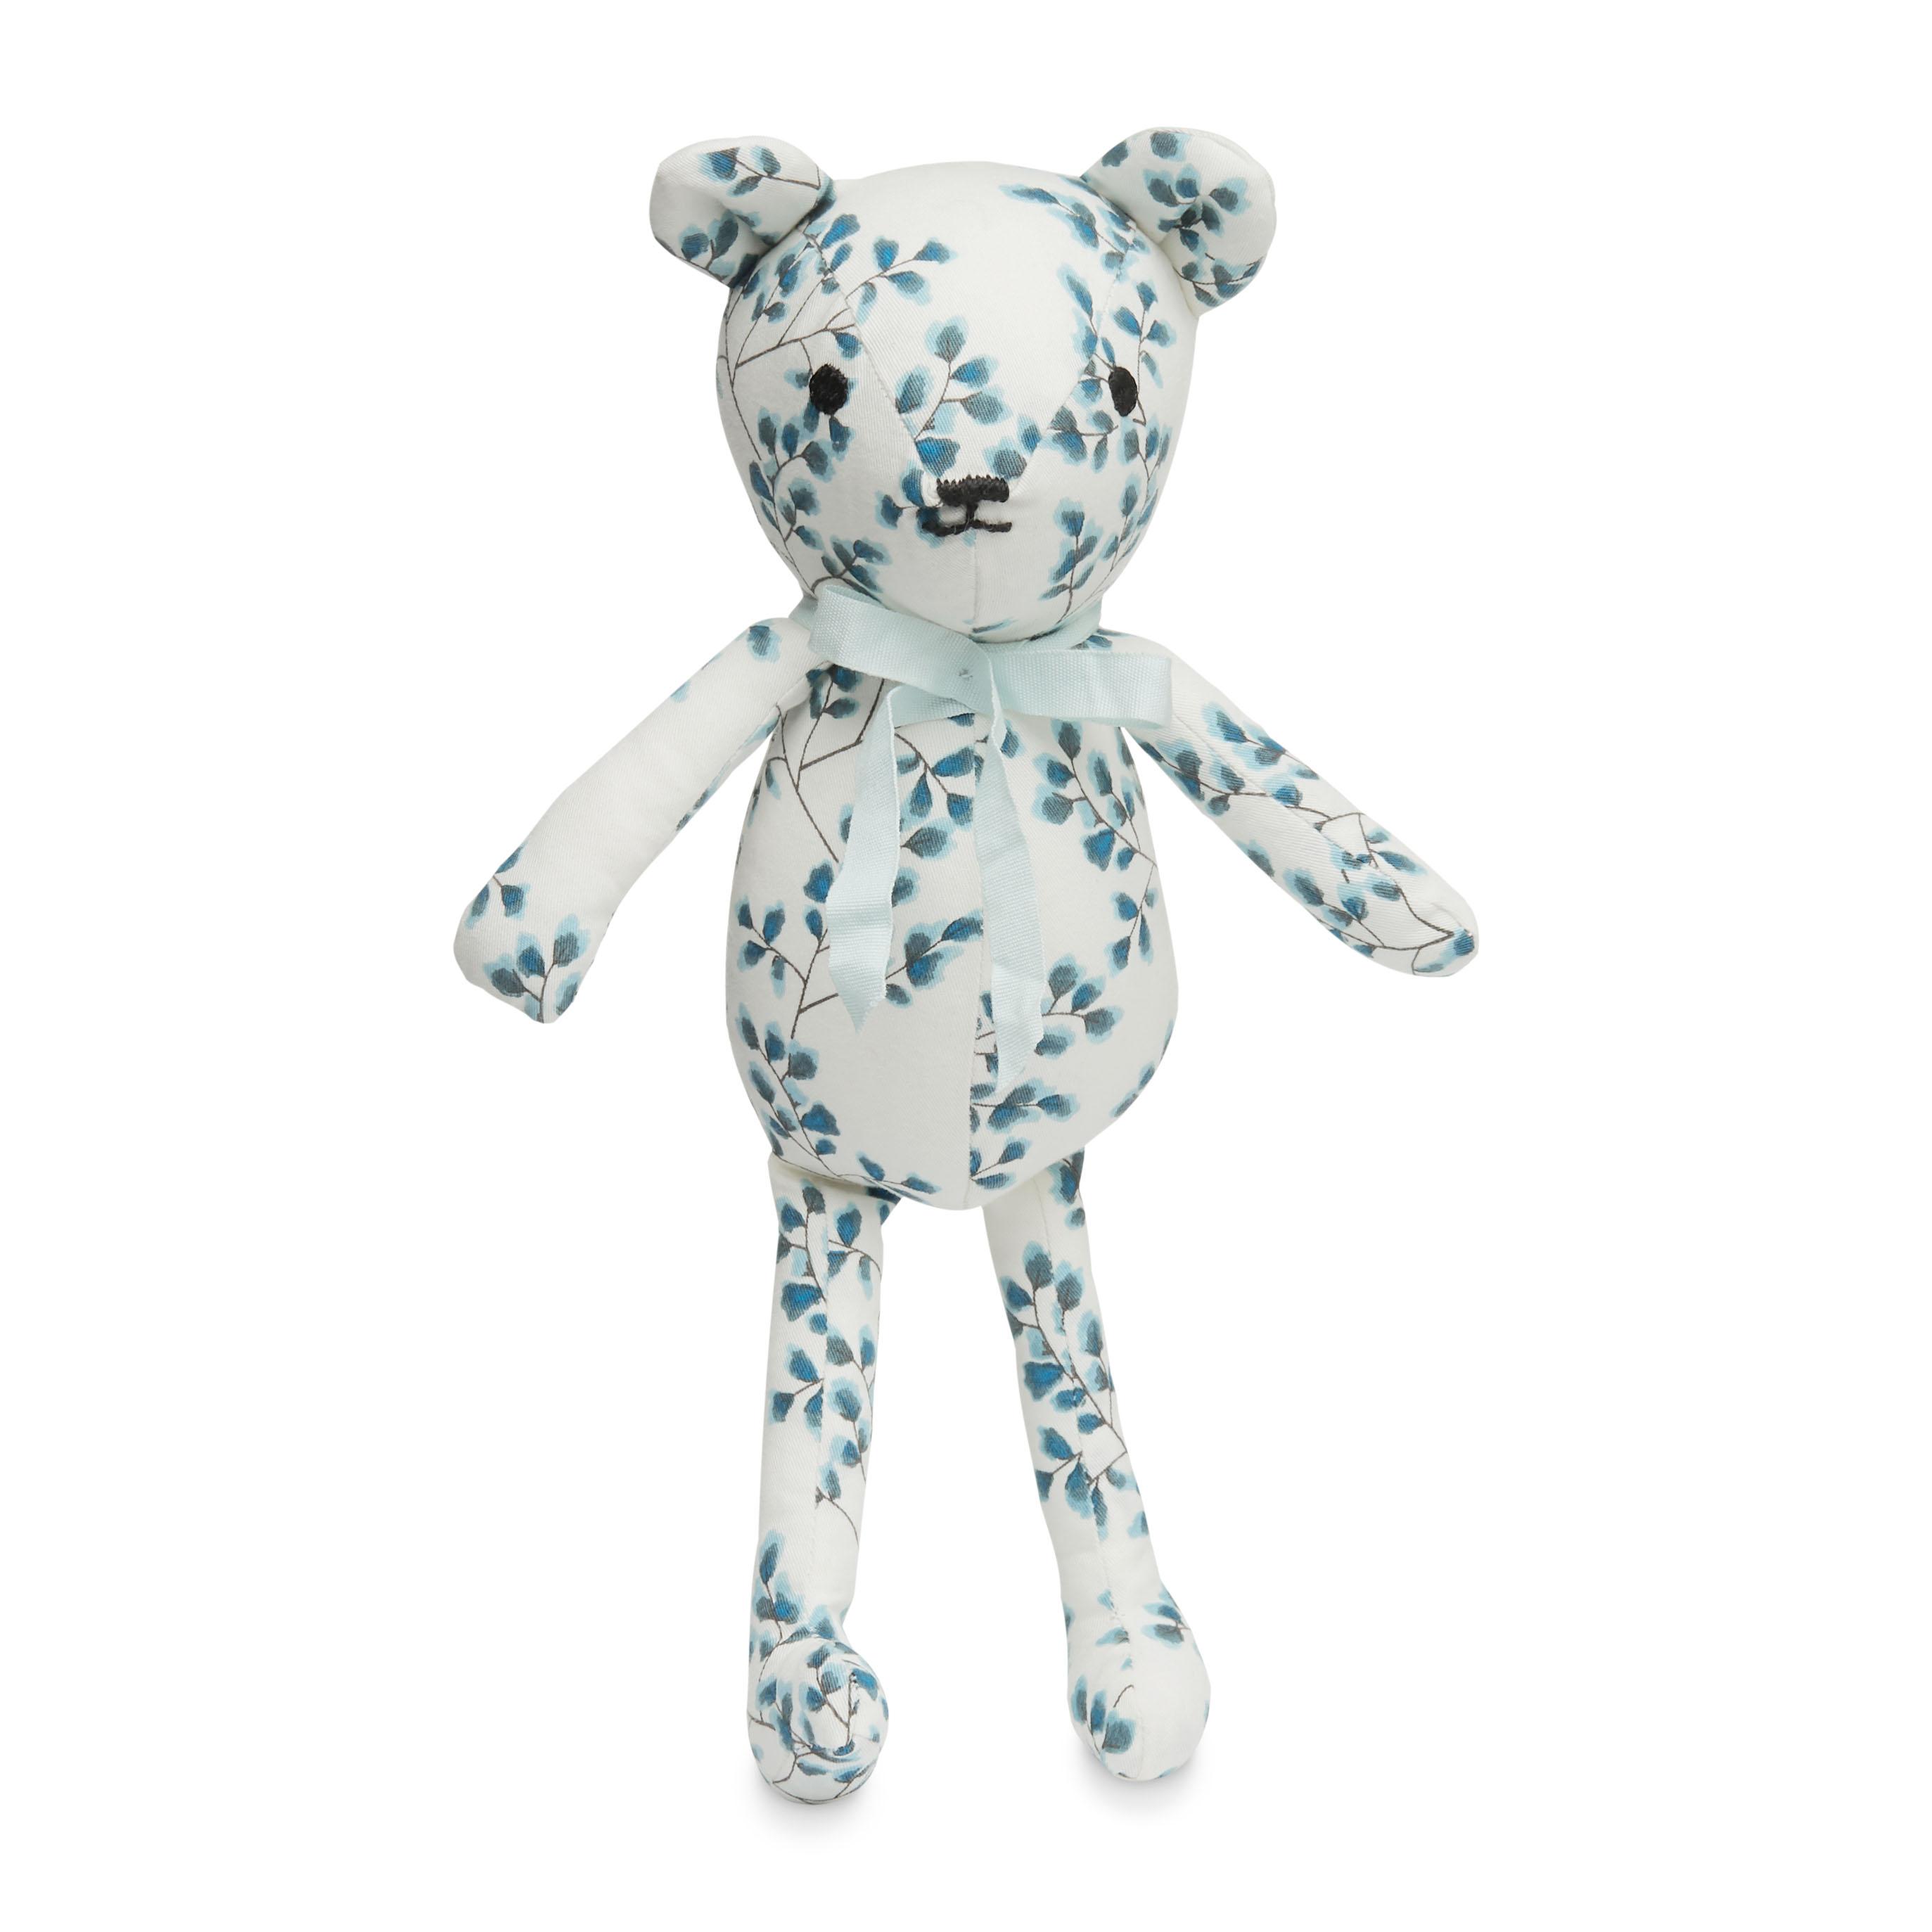 Cam Cam Copenhagen 丹麥有機棉嬰幼兒用品 / 有機棉安撫泰迪熊 - 渲藍花葉